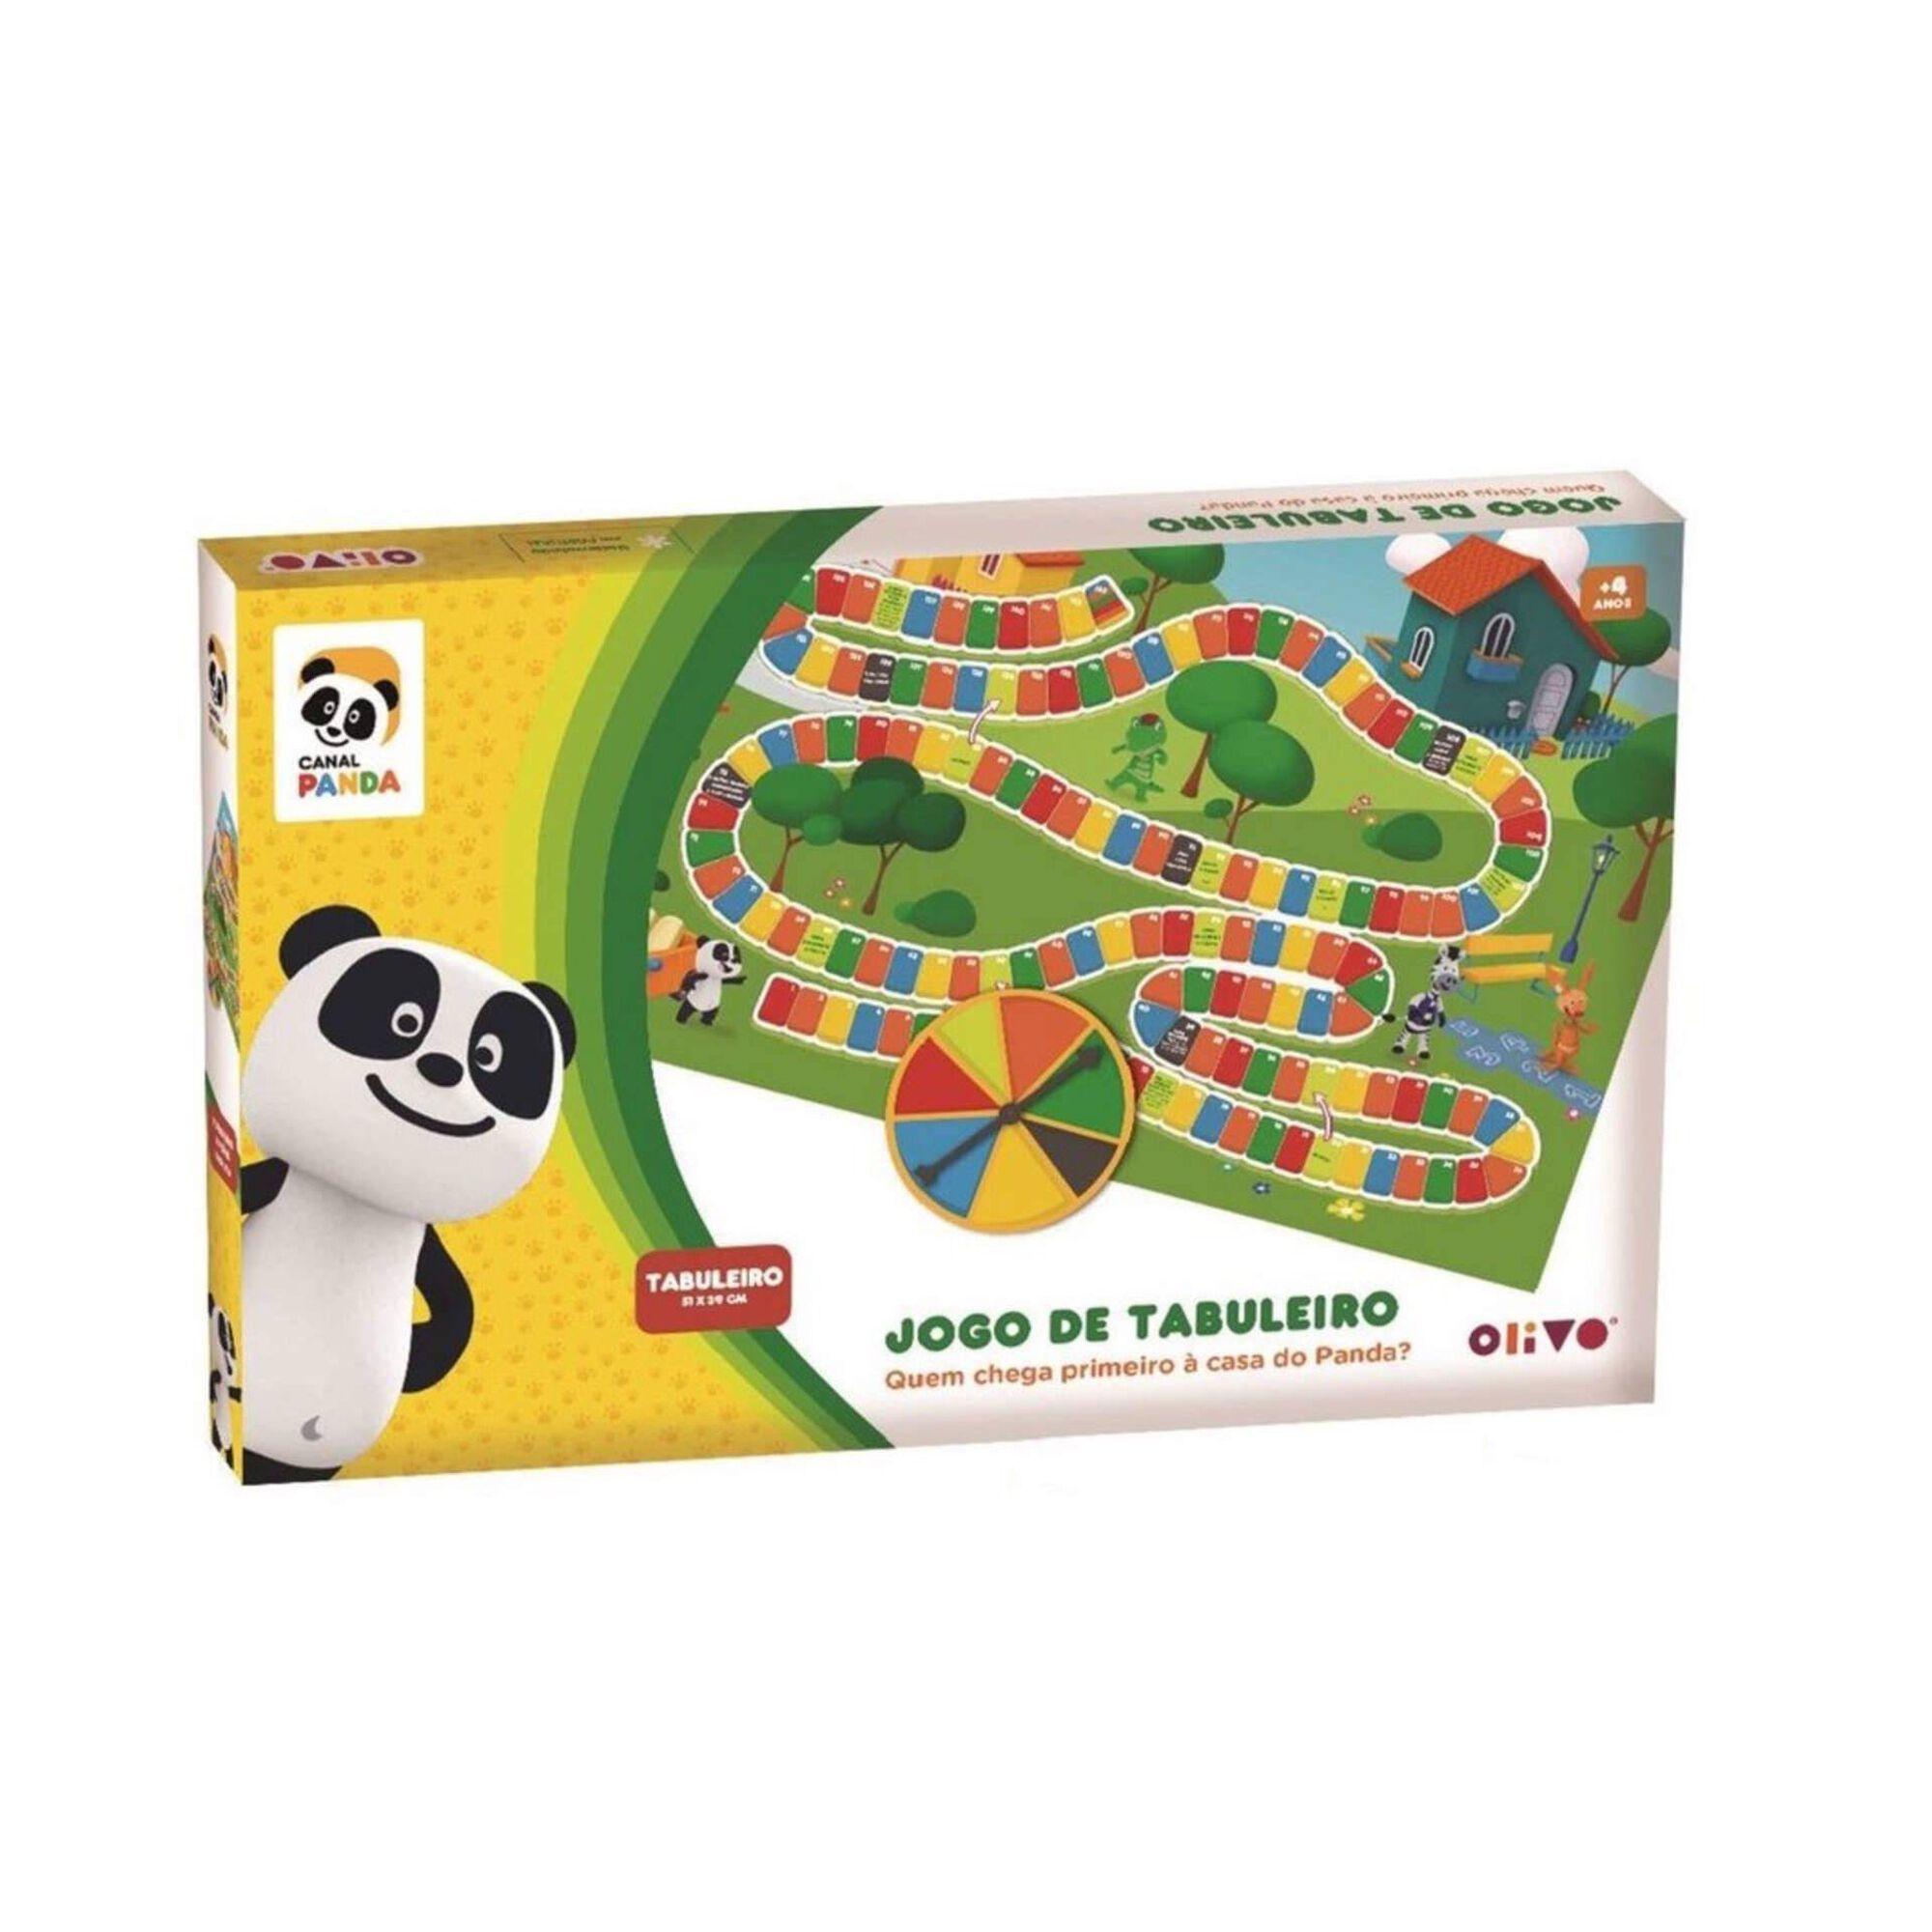 Jogo de Tabuleiro Panda